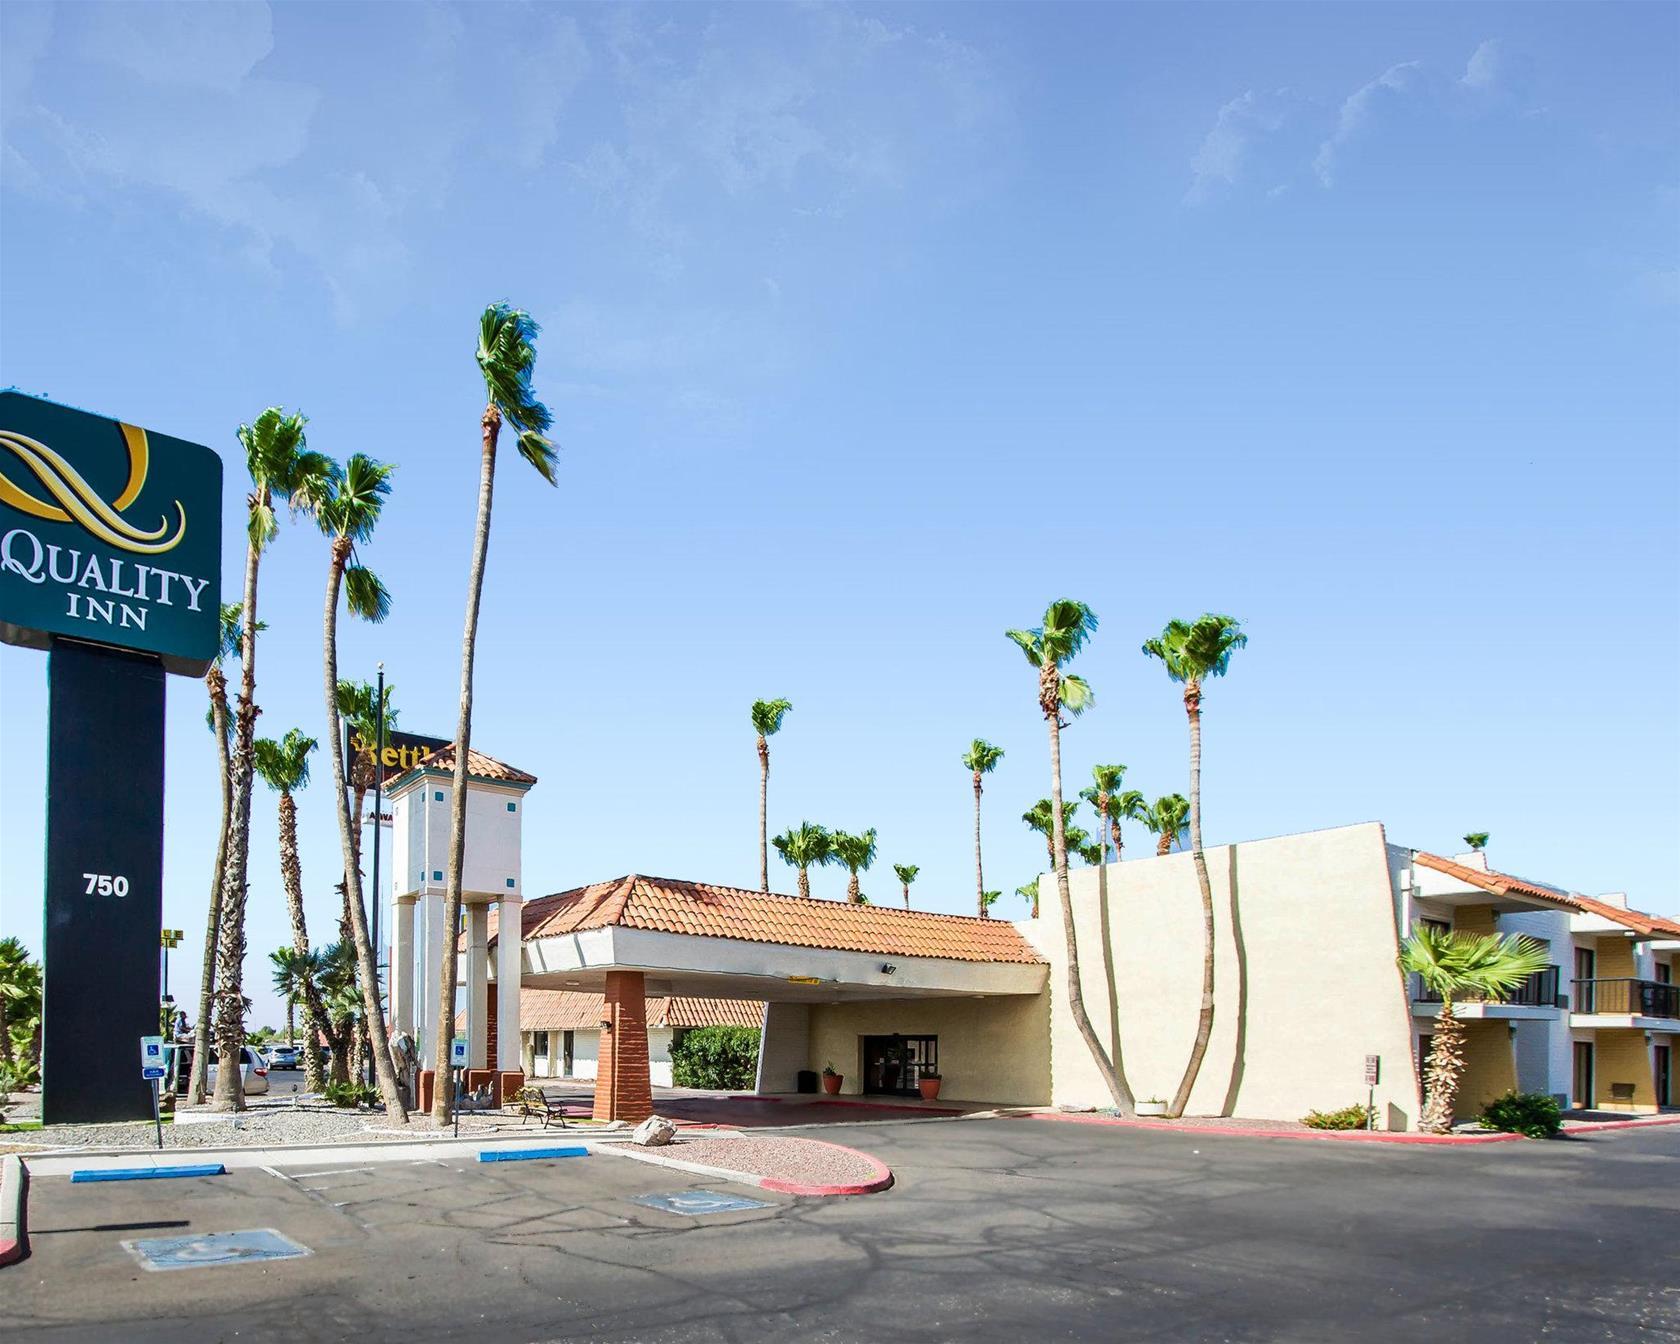 Quality Inn near Downtown Tucson, Pima